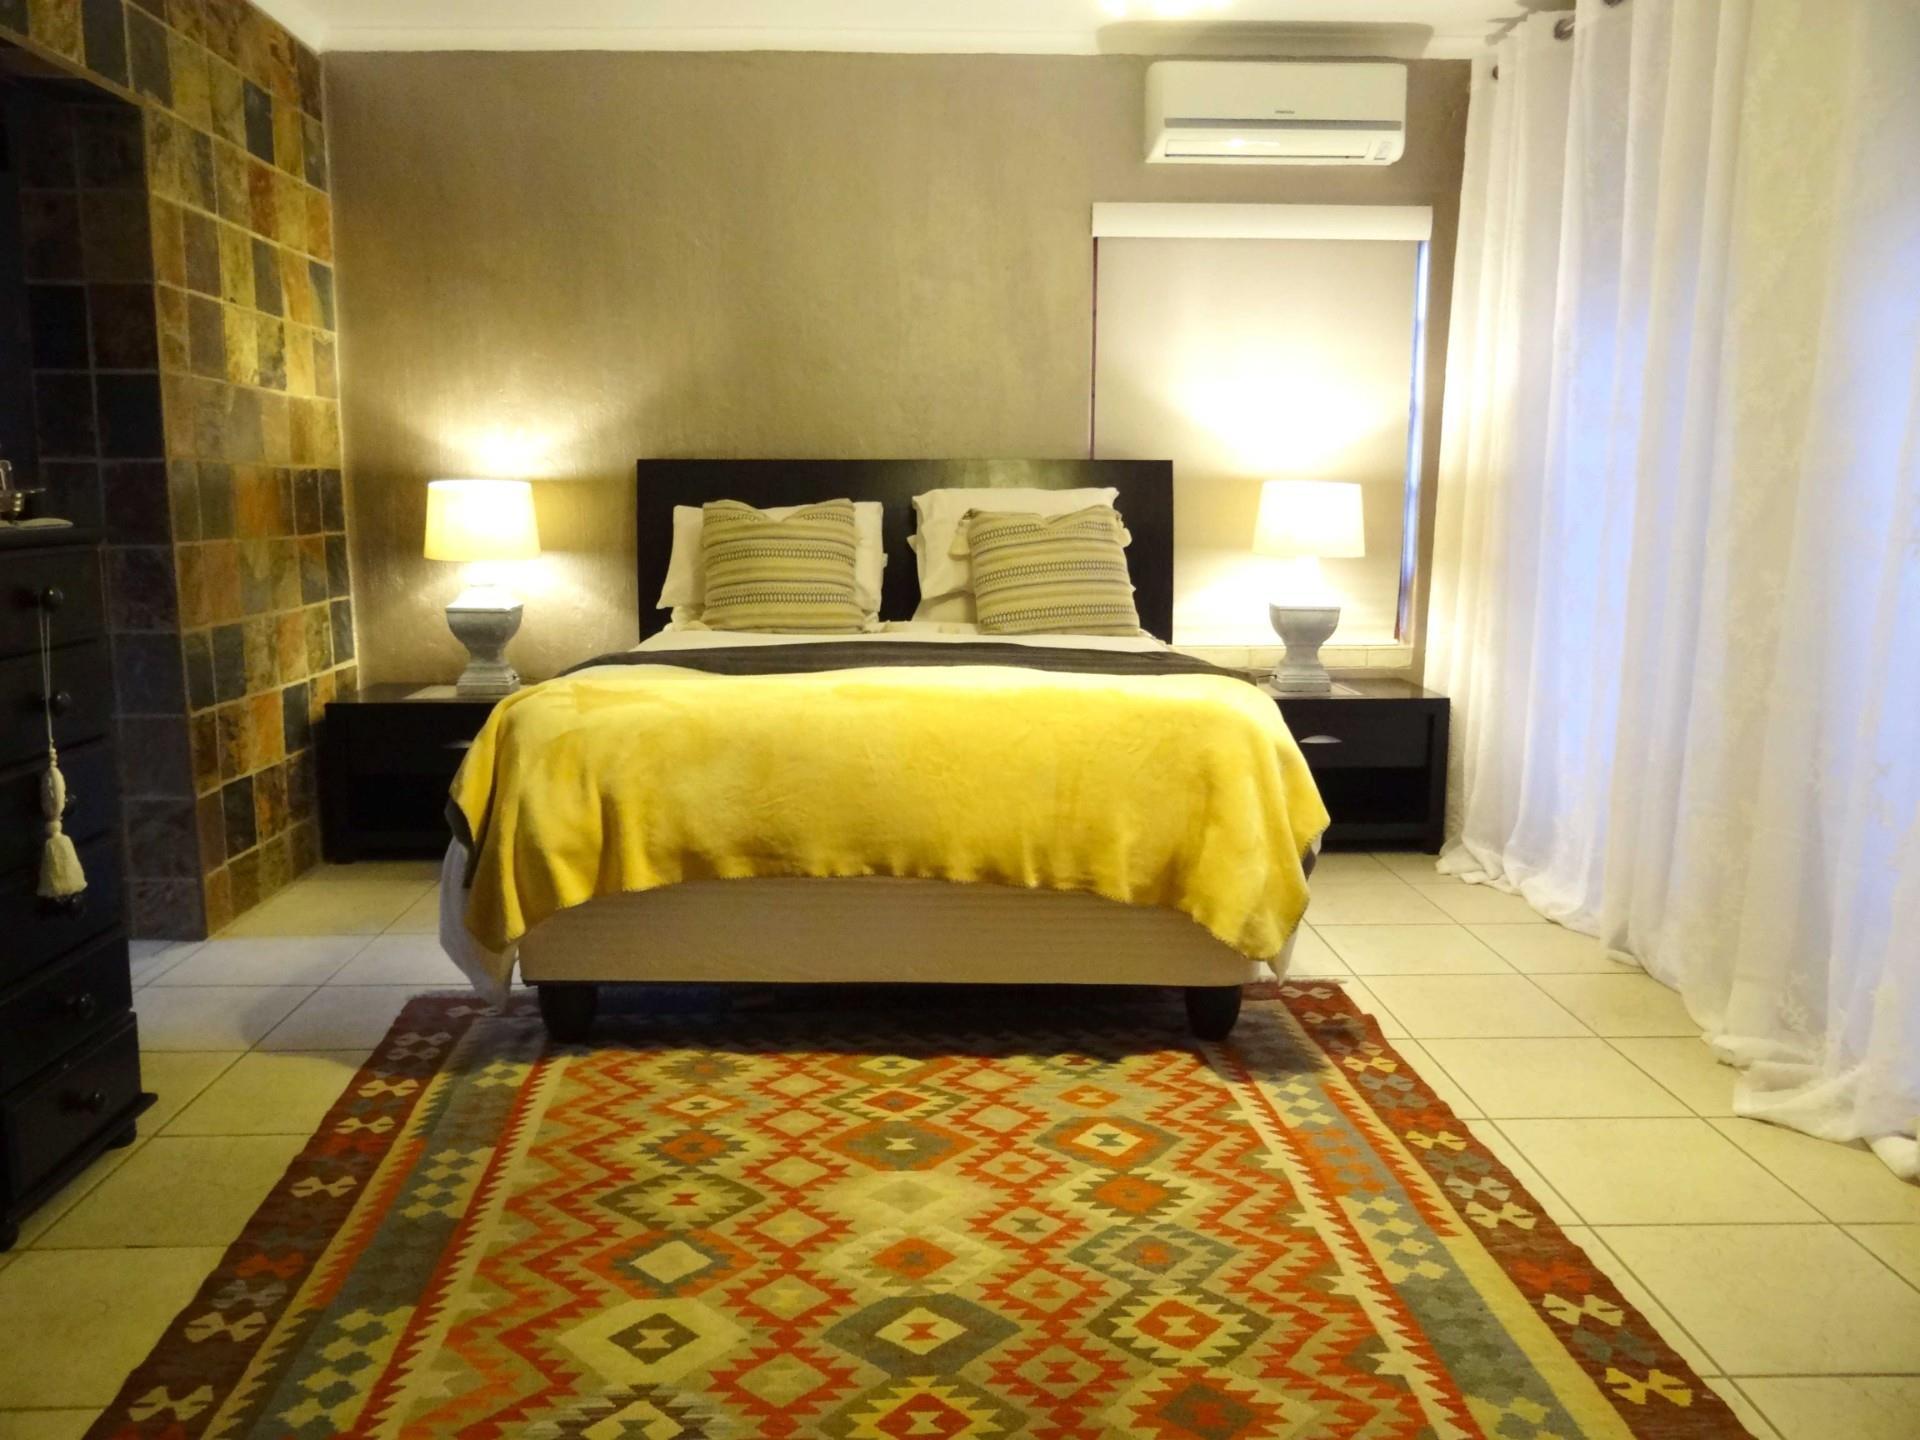 4 Bedroom House For Sale in Faerie Glen